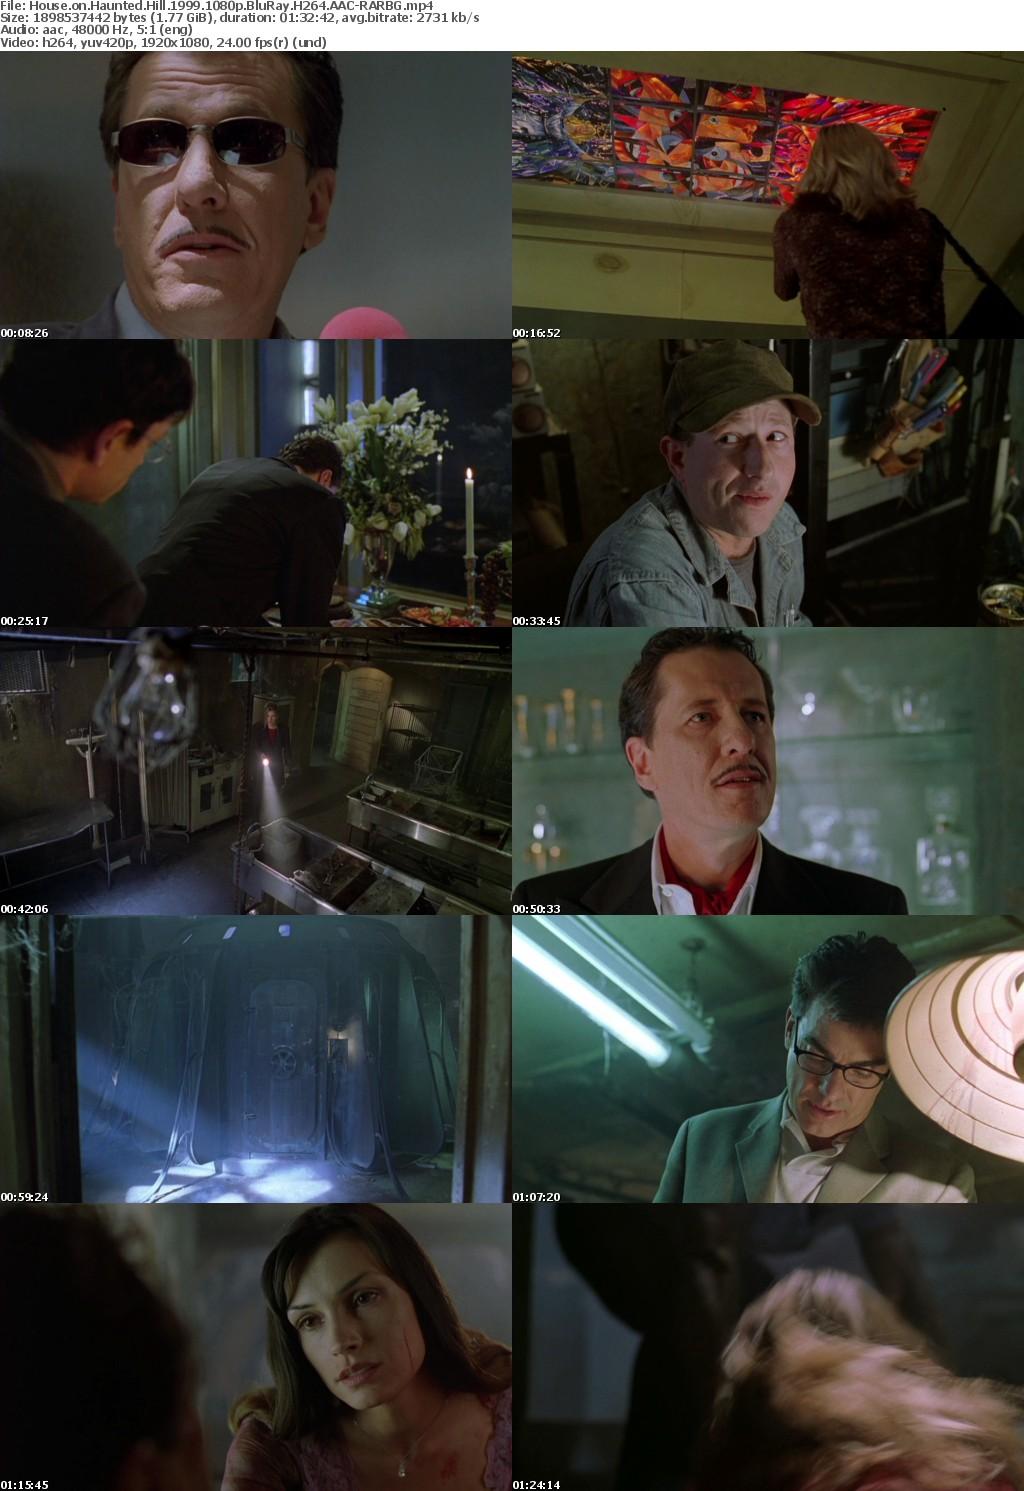 House on Haunted Hill 1999 1080p BluRay H264 AAC-RARBG